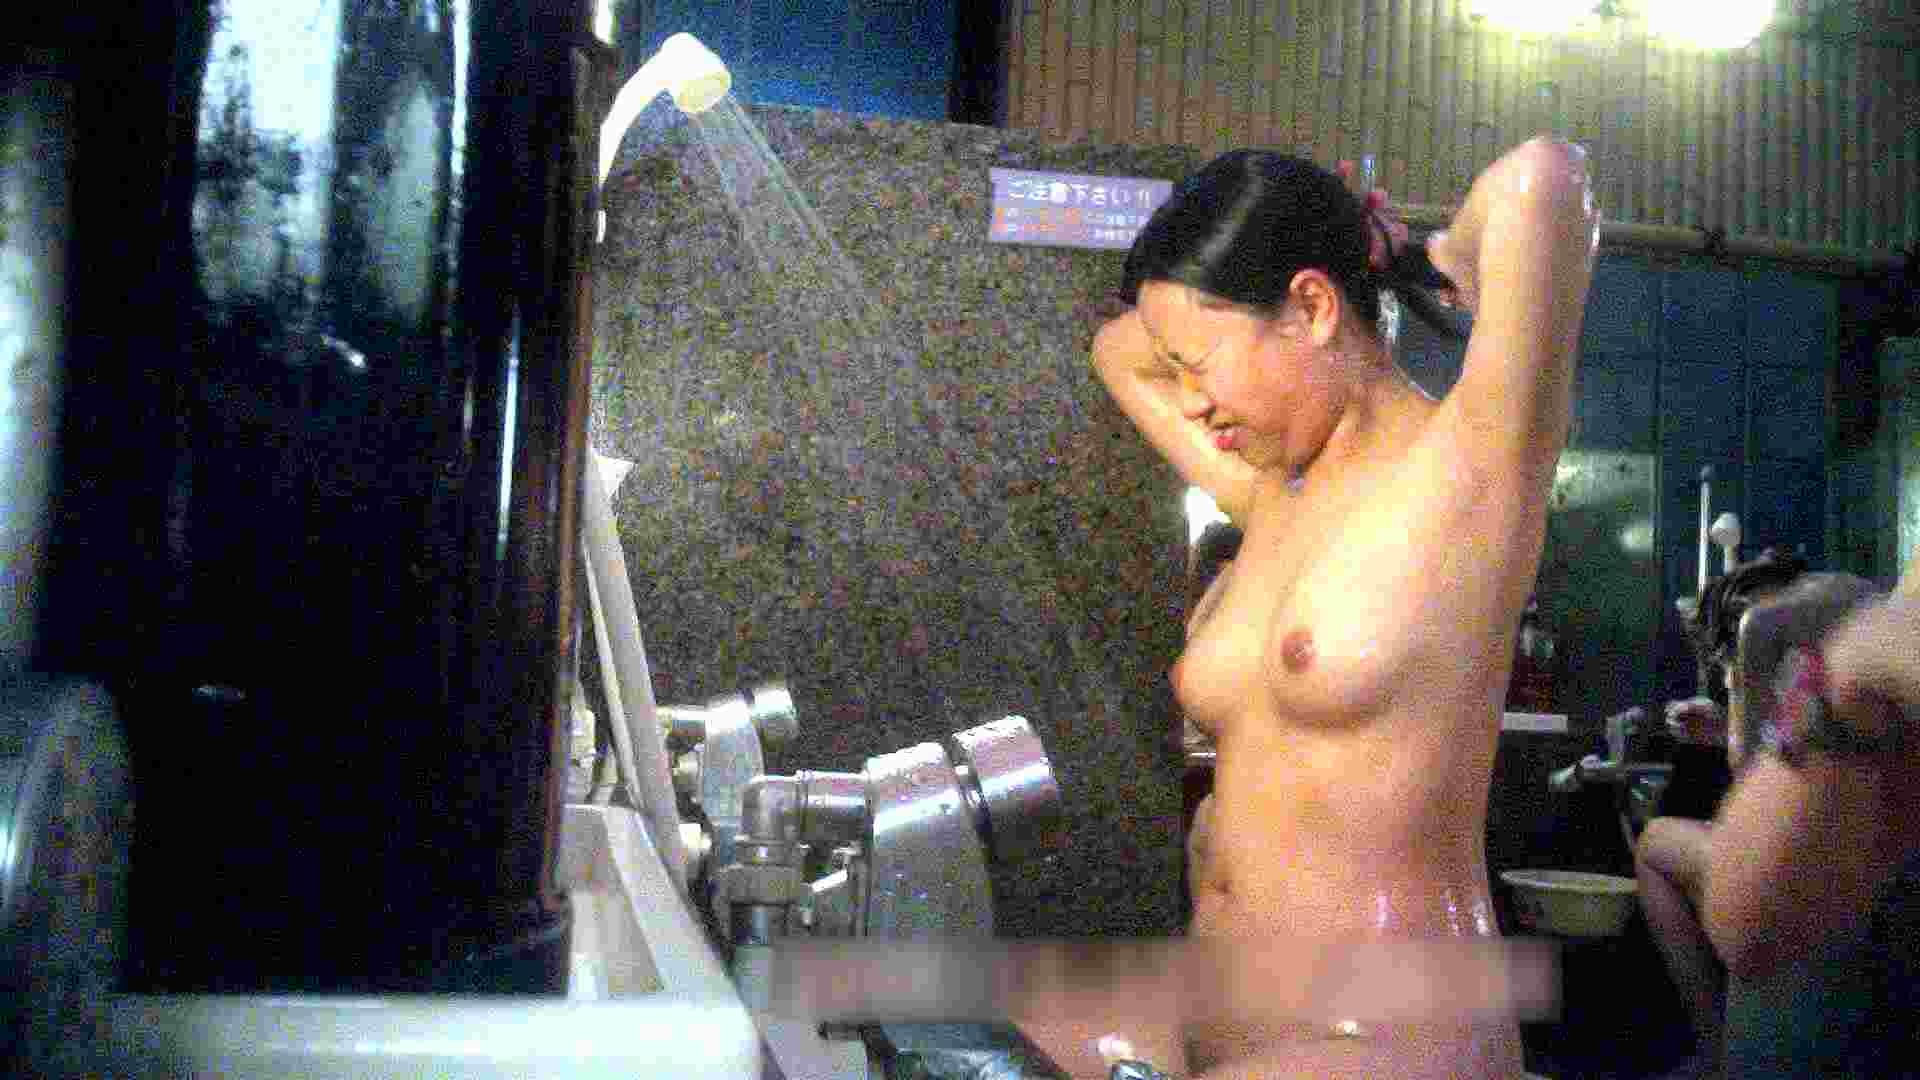 TG.08 【一等兵】陰毛の向こう側にむっちりちょいブサお嬢さん 潜入 ワレメ無修正動画無料 78枚